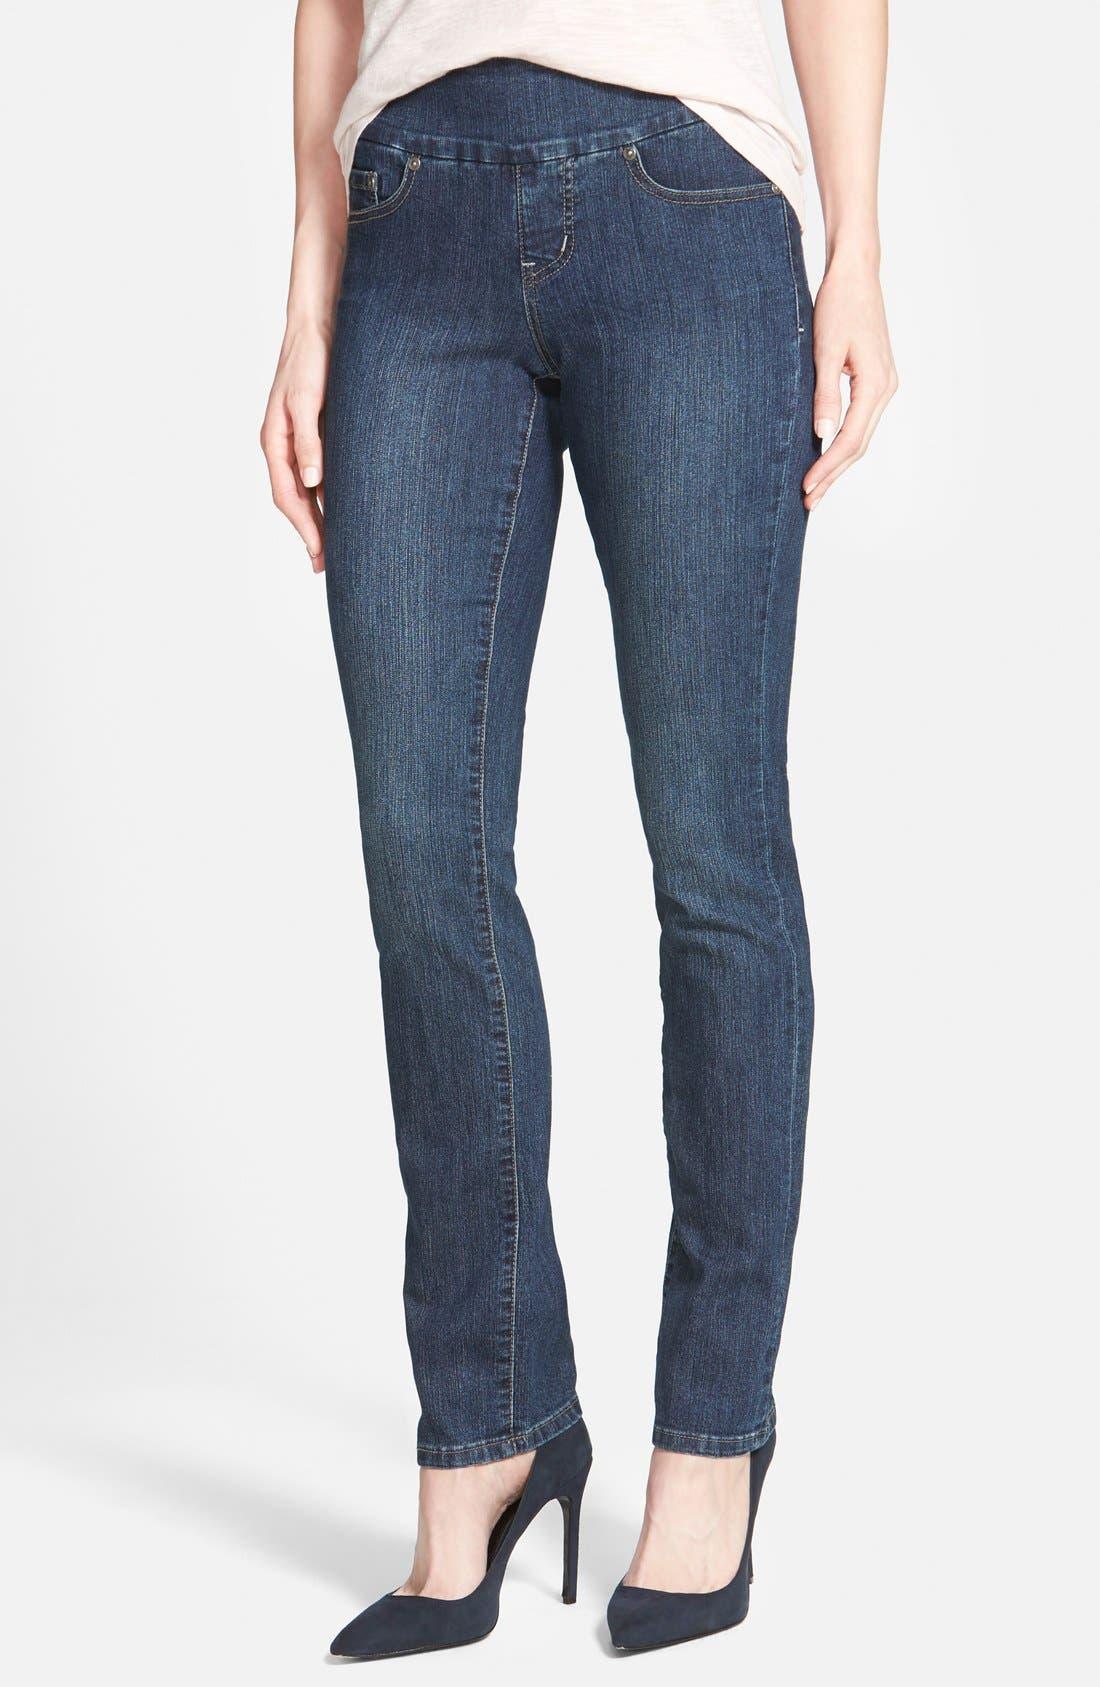 JAG JEANS Peri Straight Leg Jeans